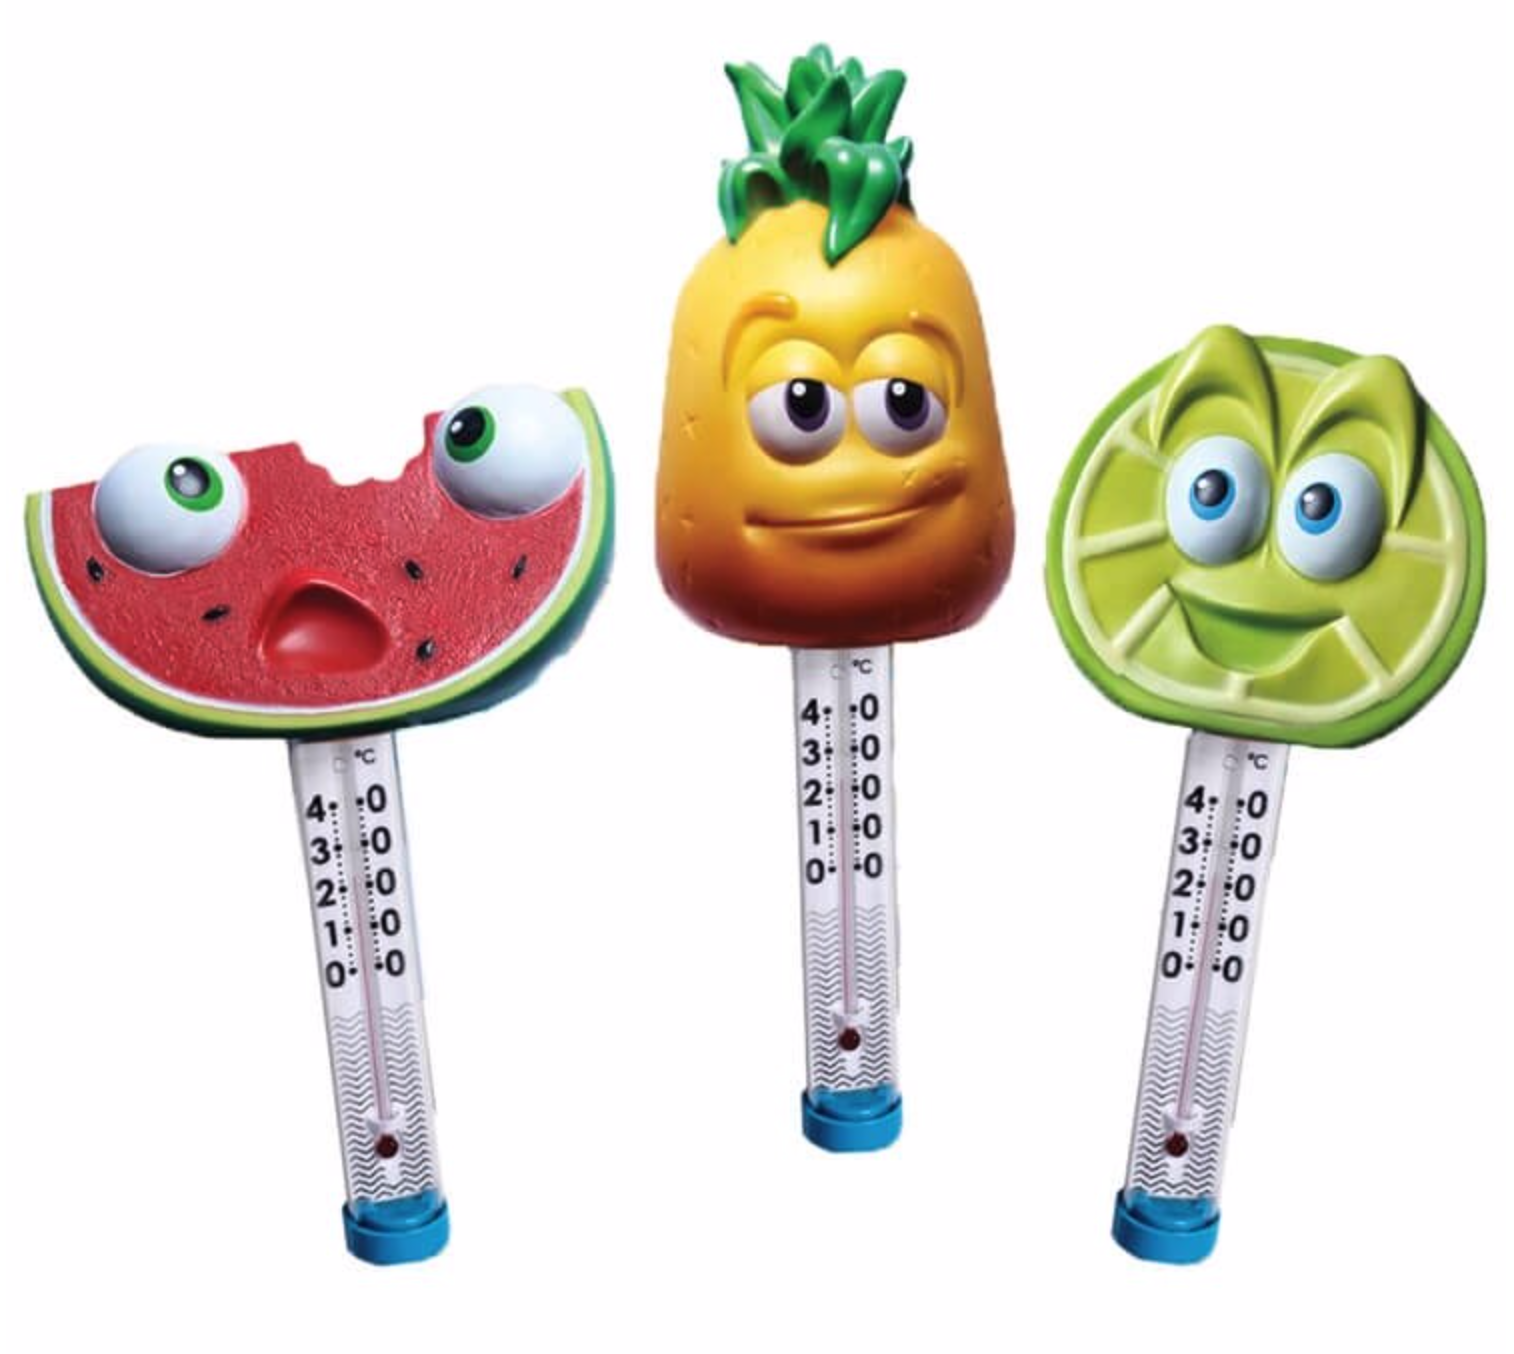 Afbeelding van Tutti Frutti zwembad thermometer